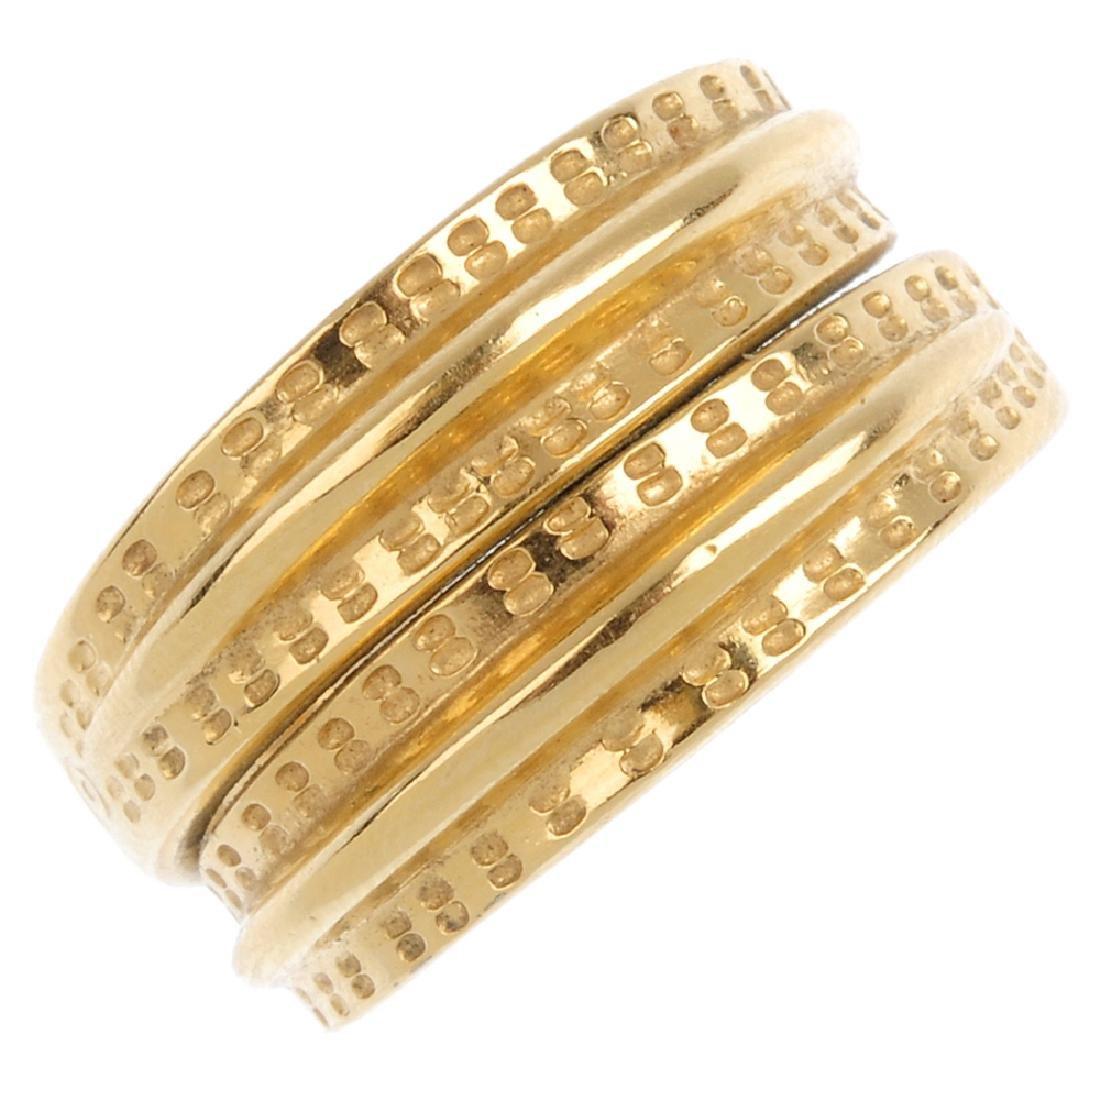 DAVID ANDERSON - a mid 20th century 'Saga' ring.